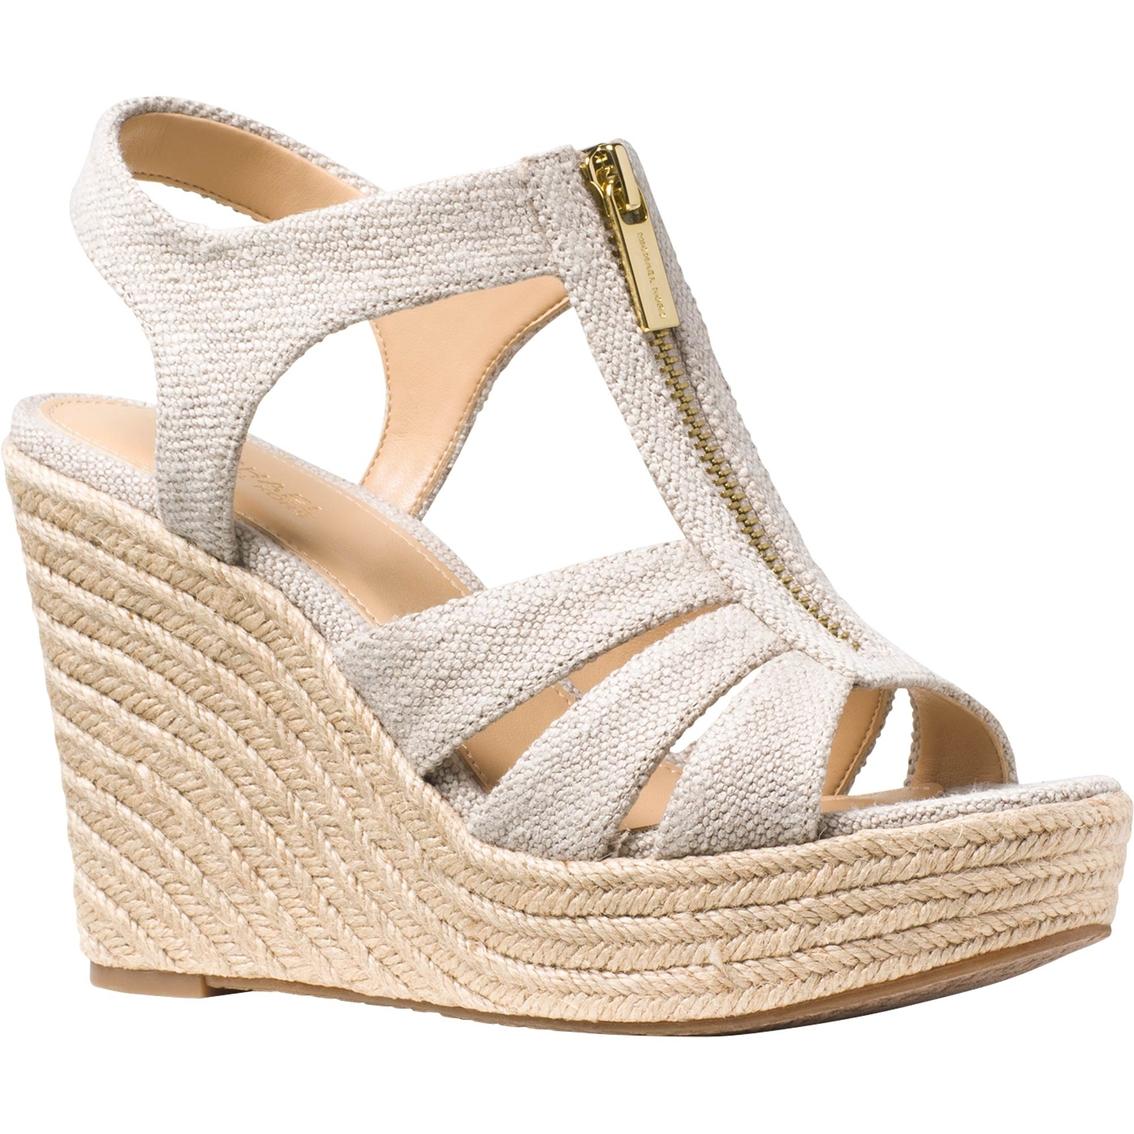 9a58fd9b8aea Michael Kors Berkley Wedge Sandals